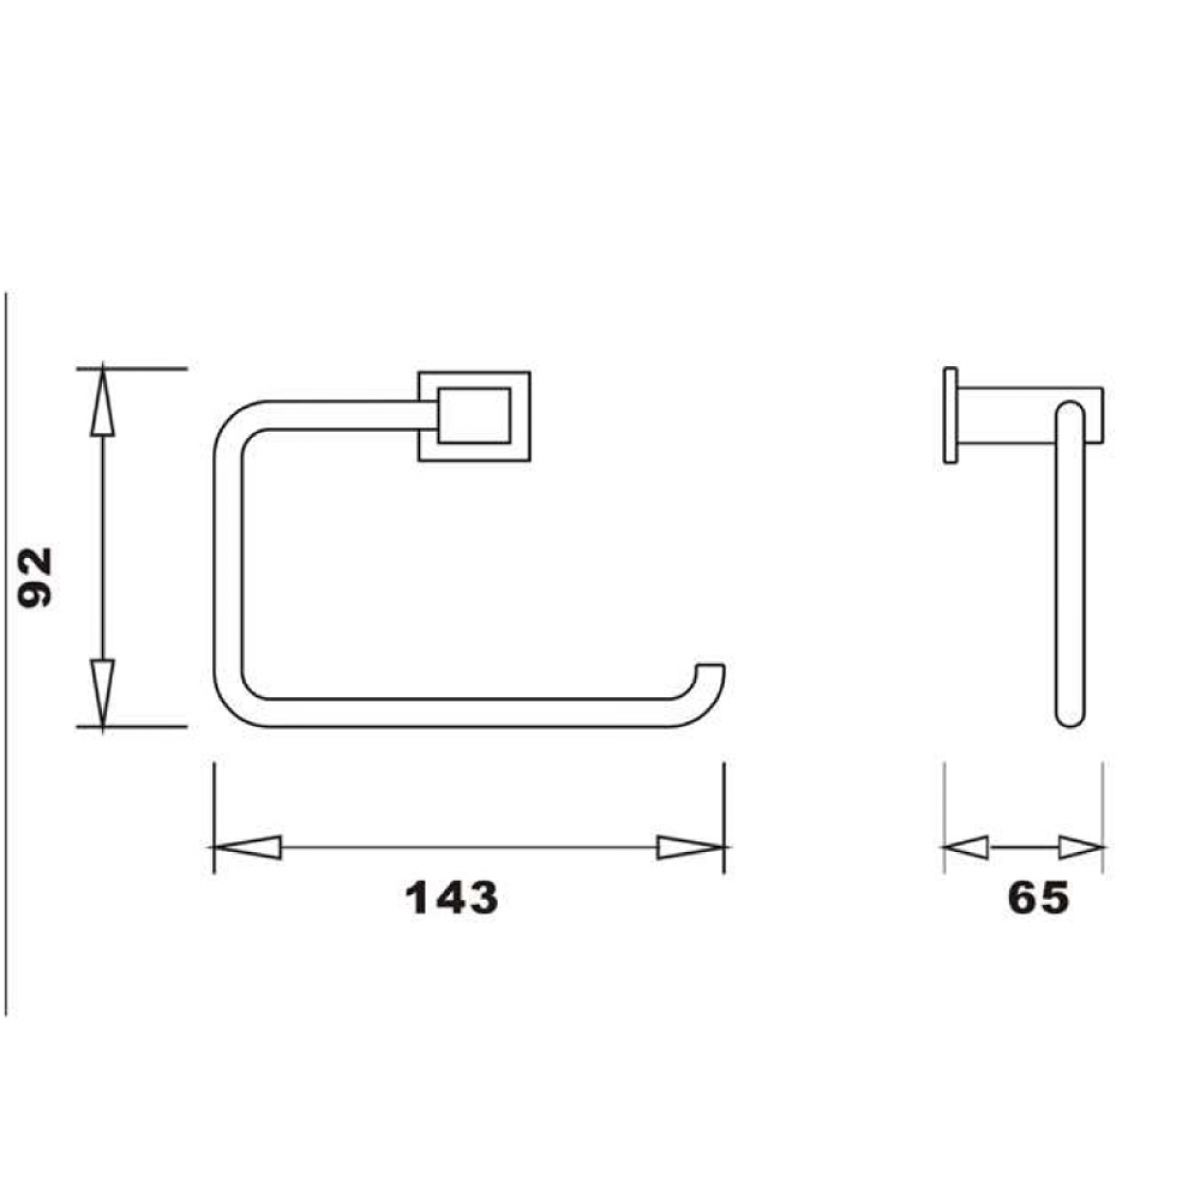 RAK Cubis Black Toilet Roll Holder Measurements